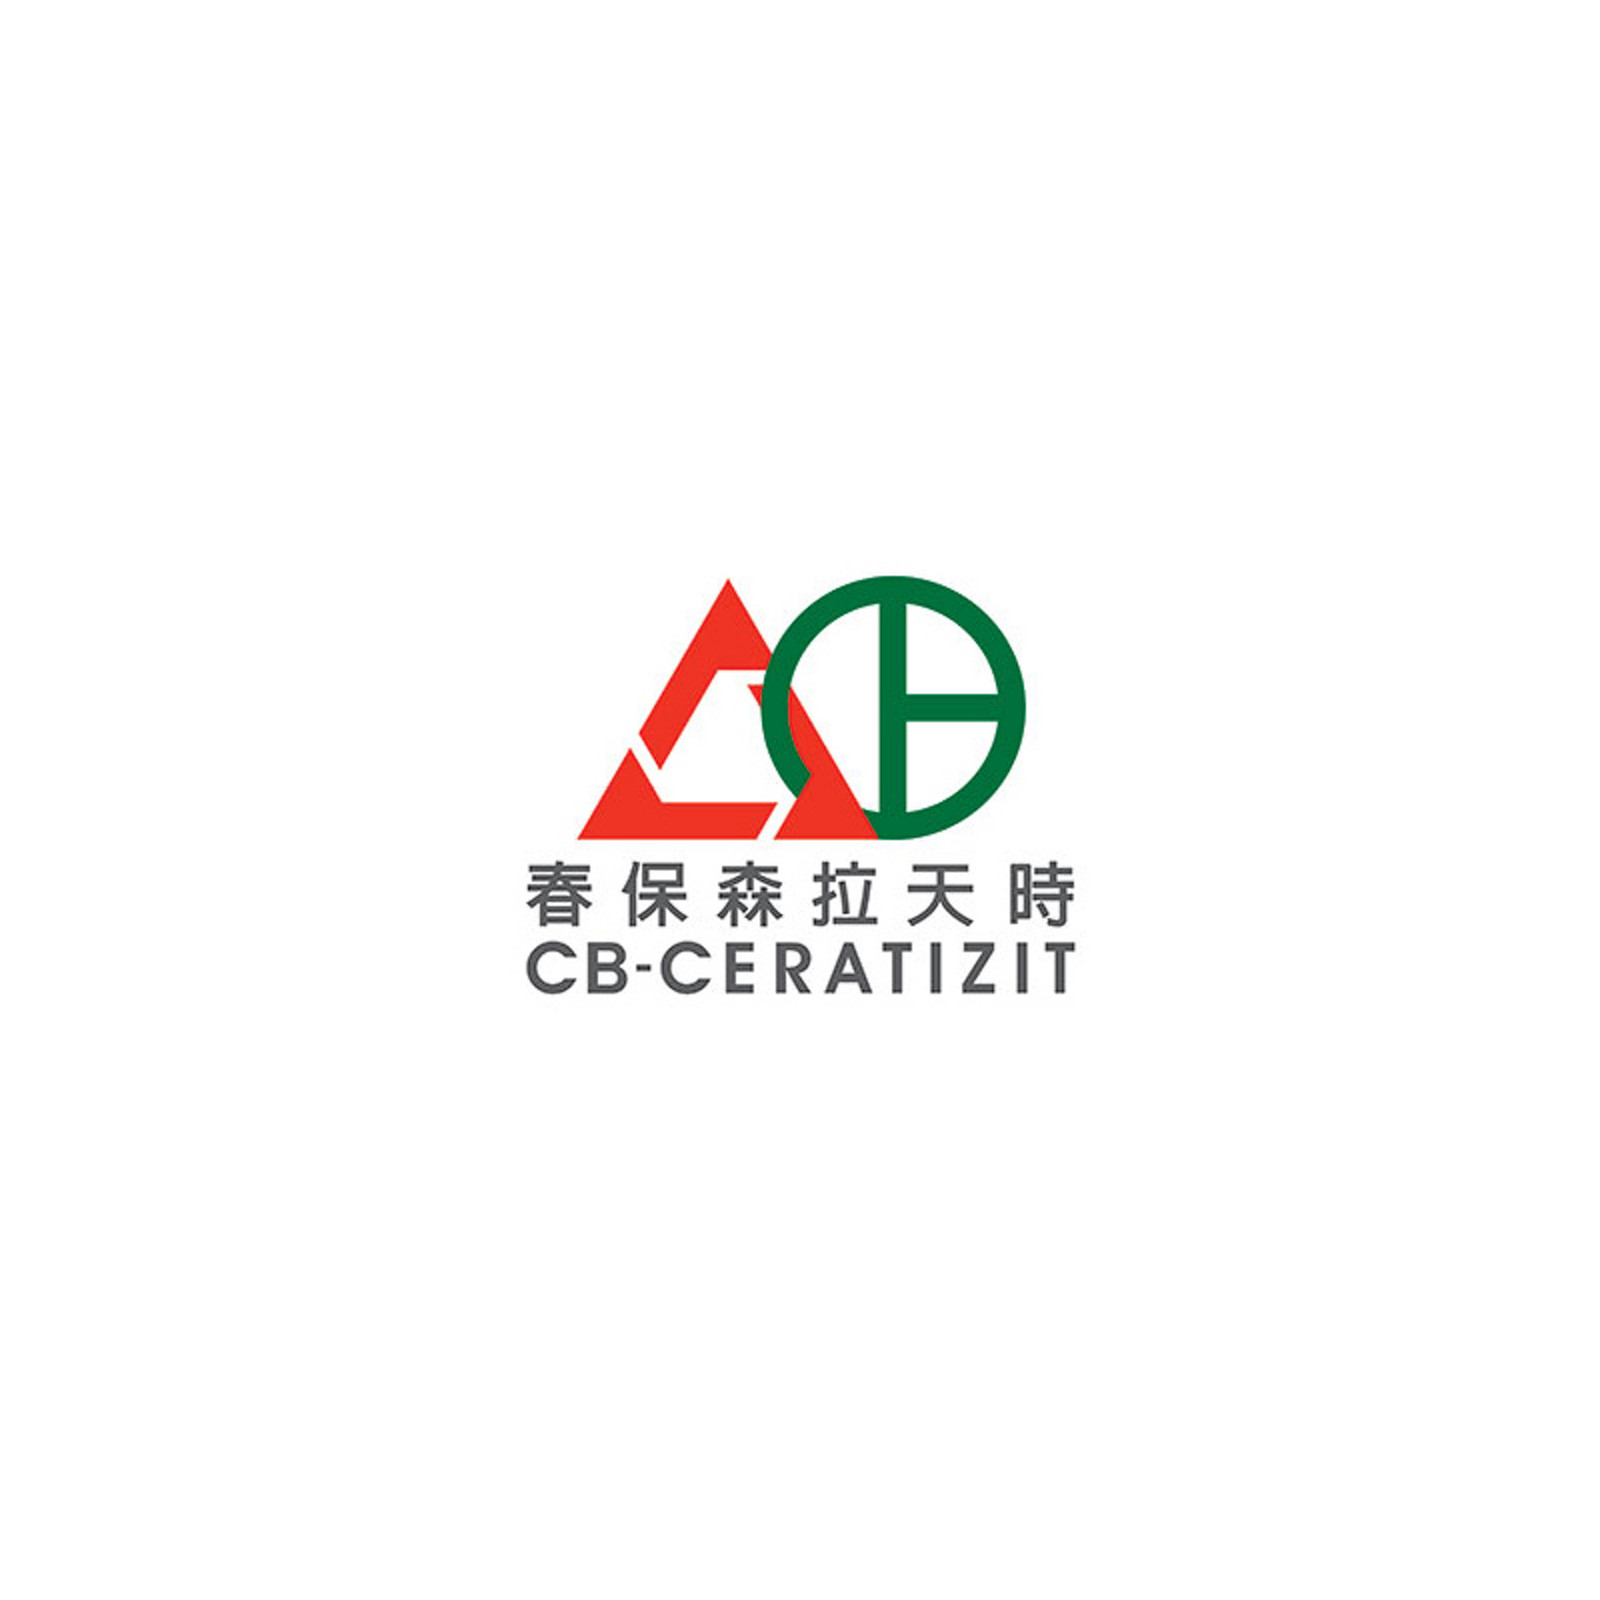 CB-CERATIZIT